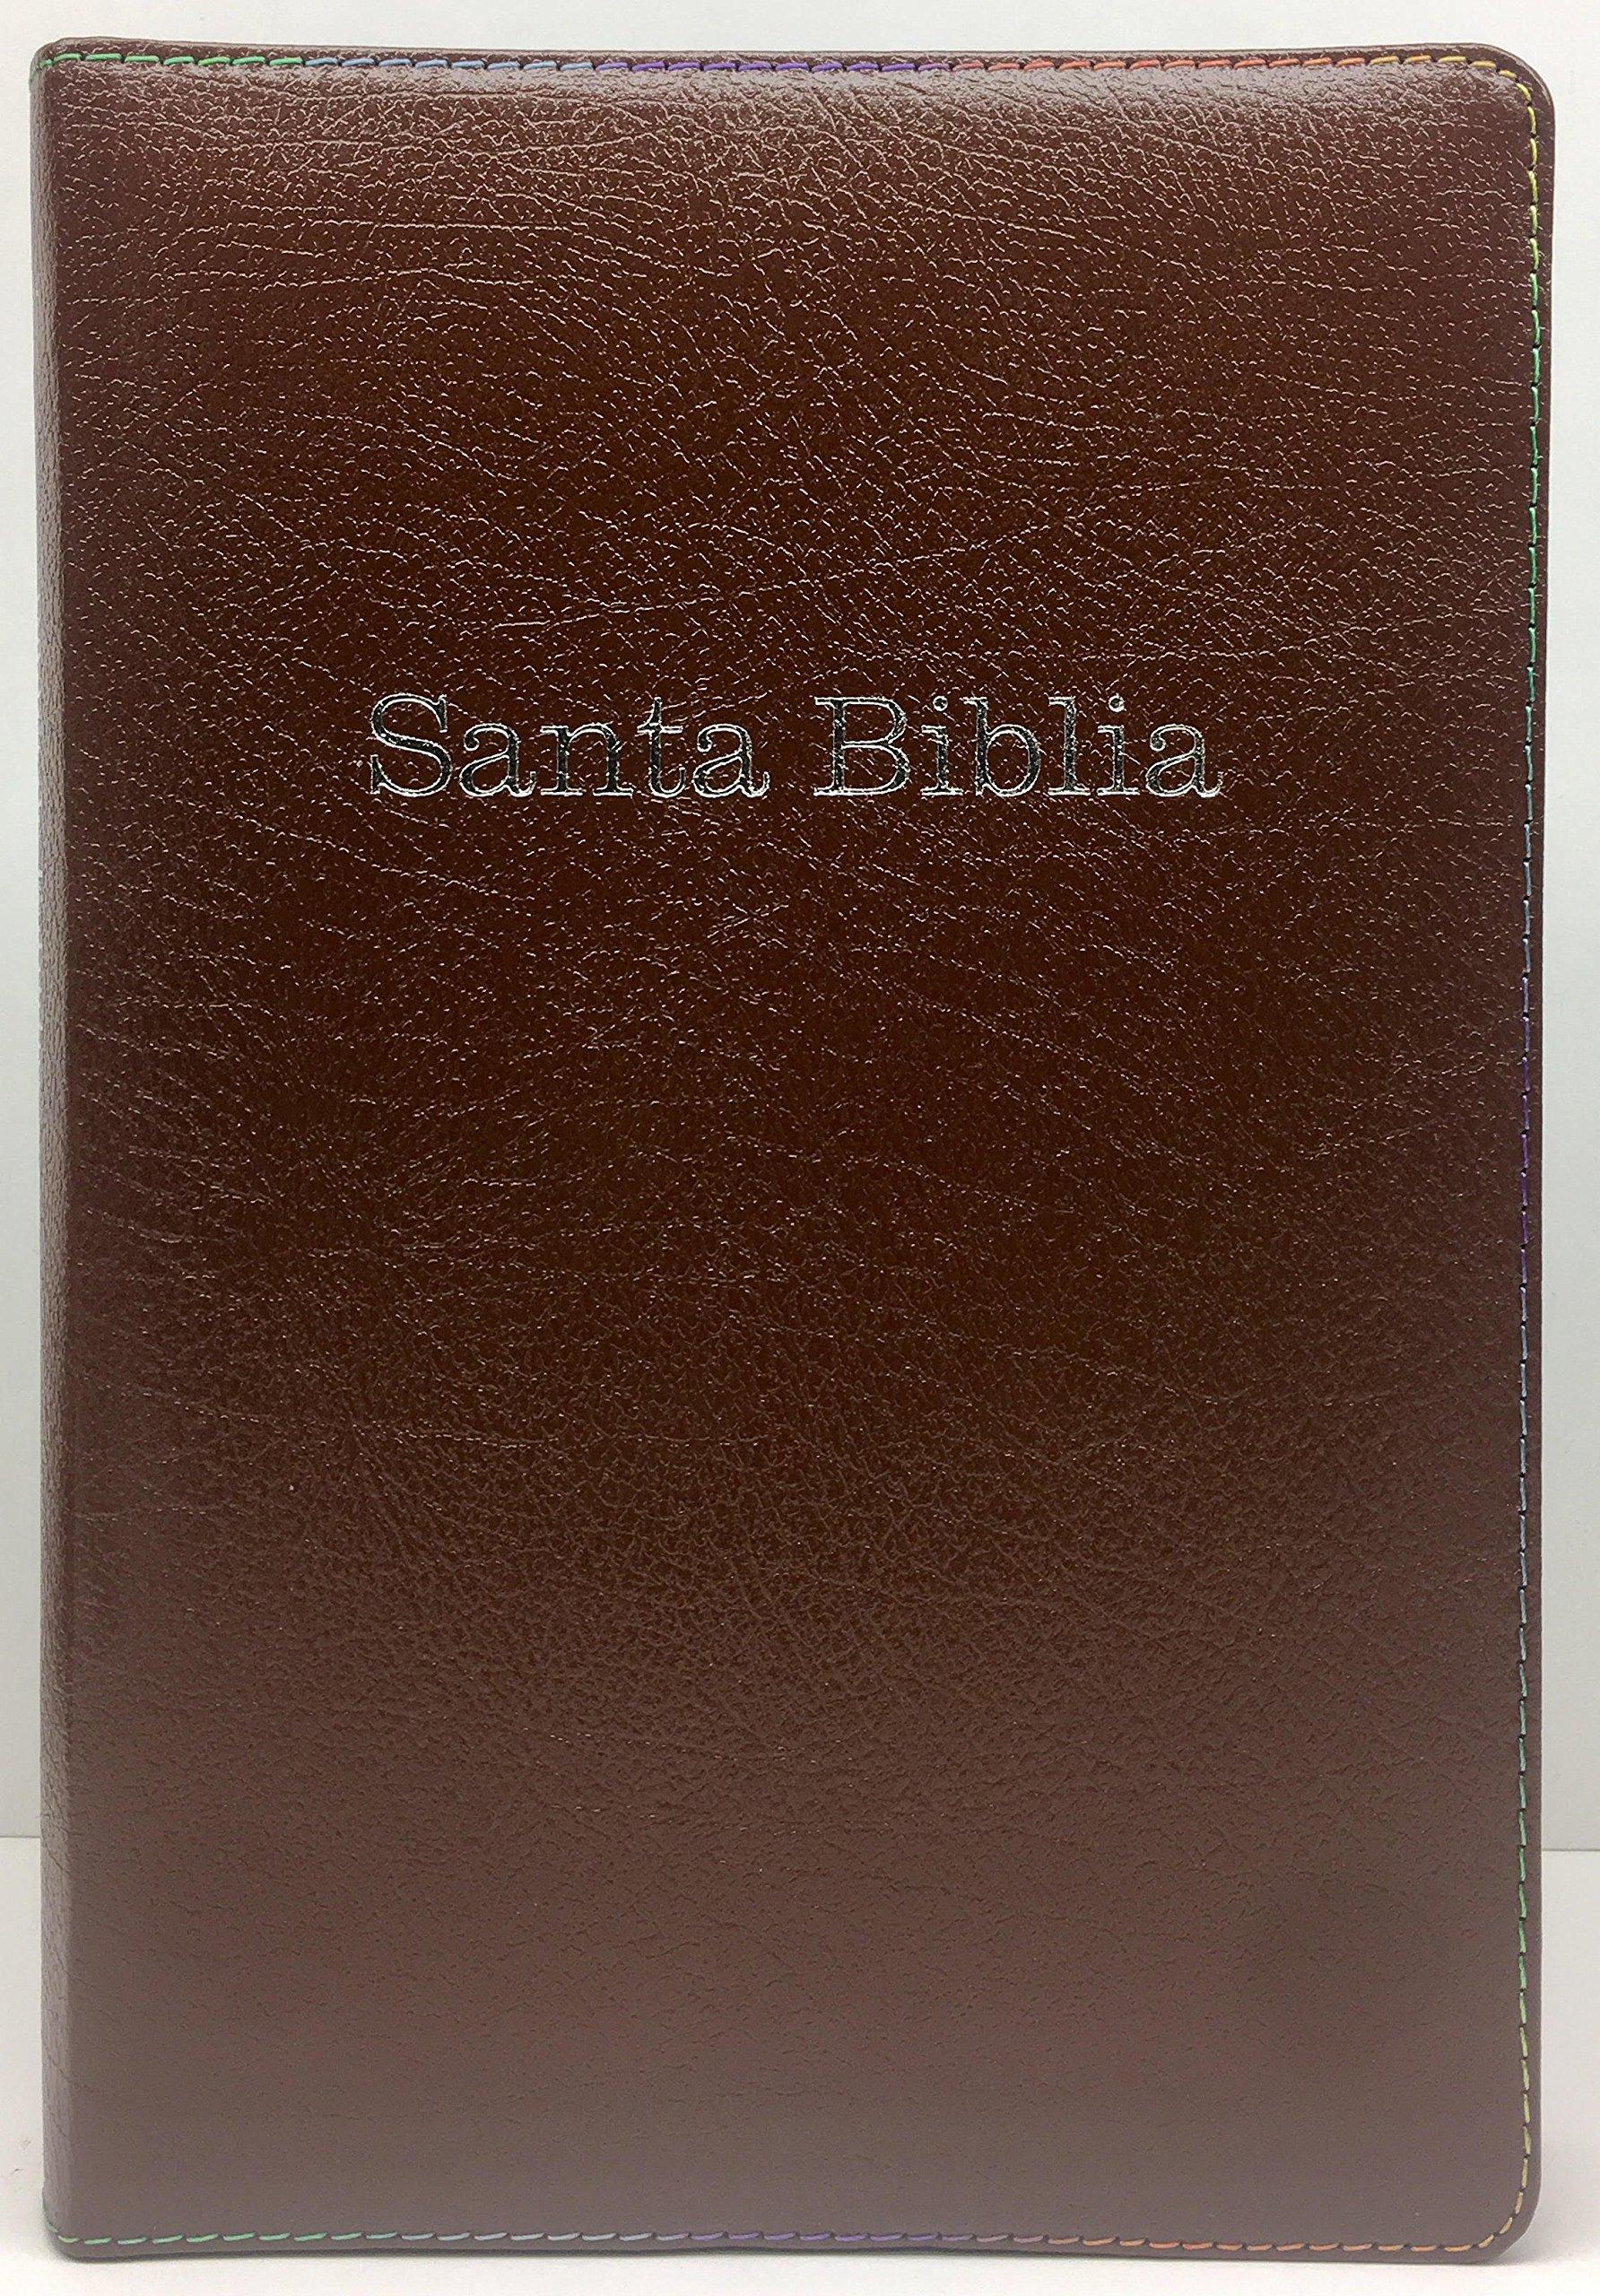 RVR 1960 Biblia de Estudio Arco Iris, chocolate, piel ...